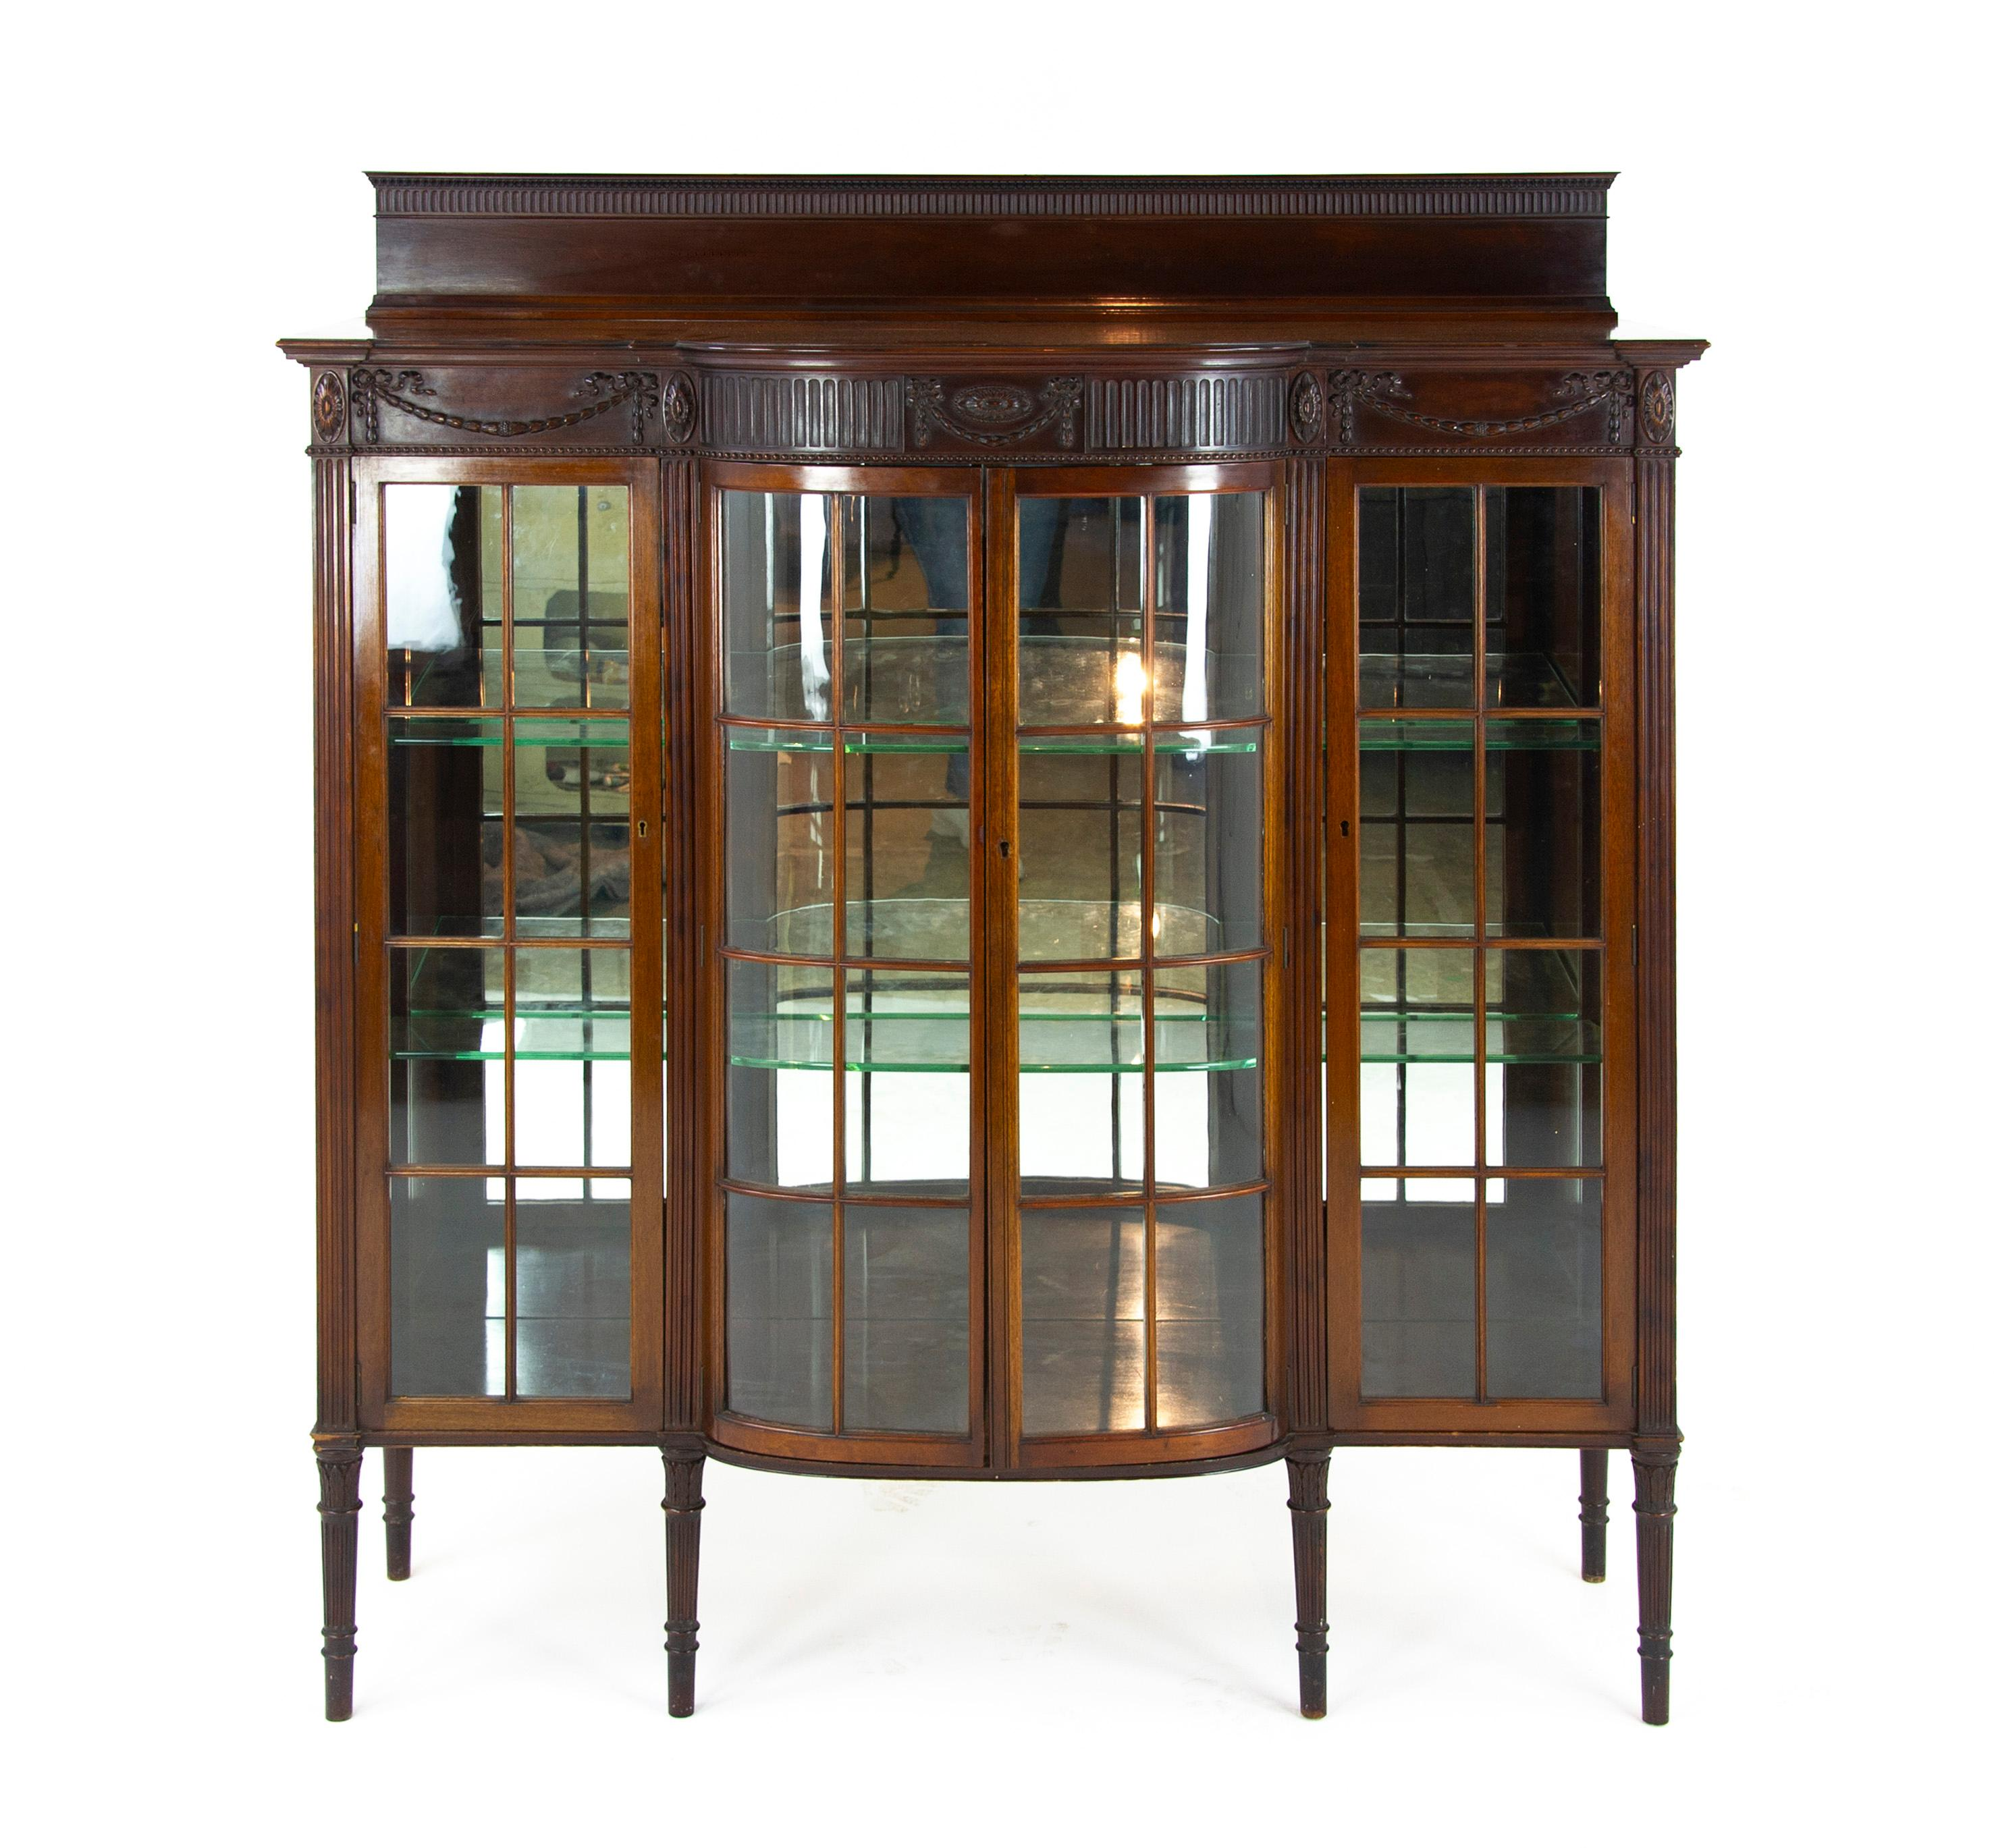 Genial Antique Walnut Cabinet, Breakfront Display Cabinet, Scotland, 1920